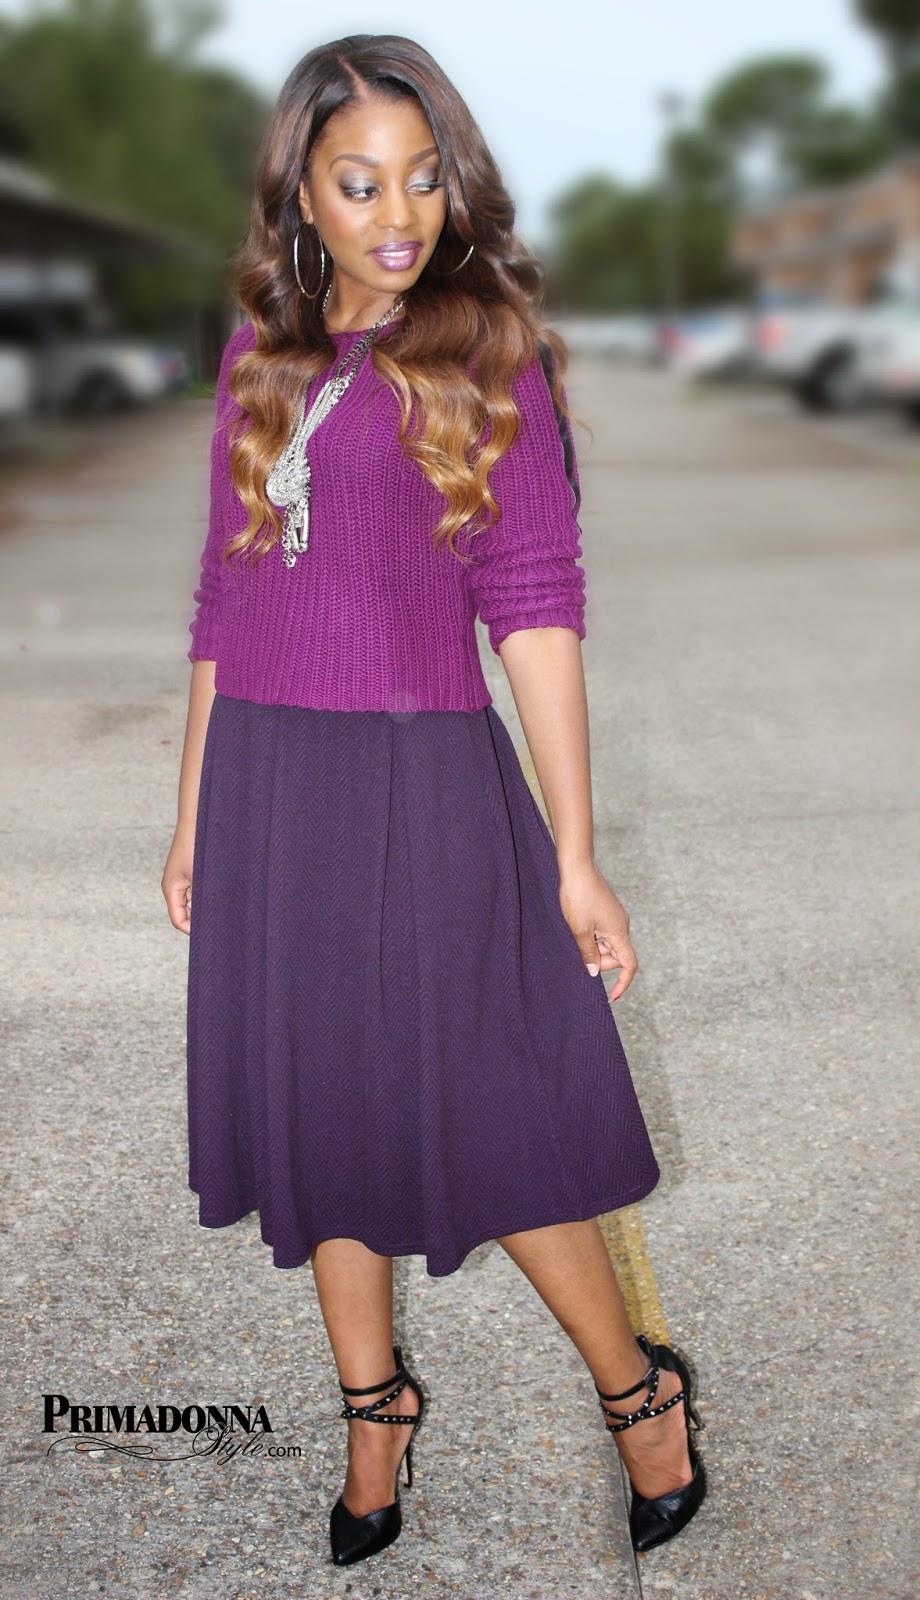 purple lipstick revlon va va violet nyx aphrodite